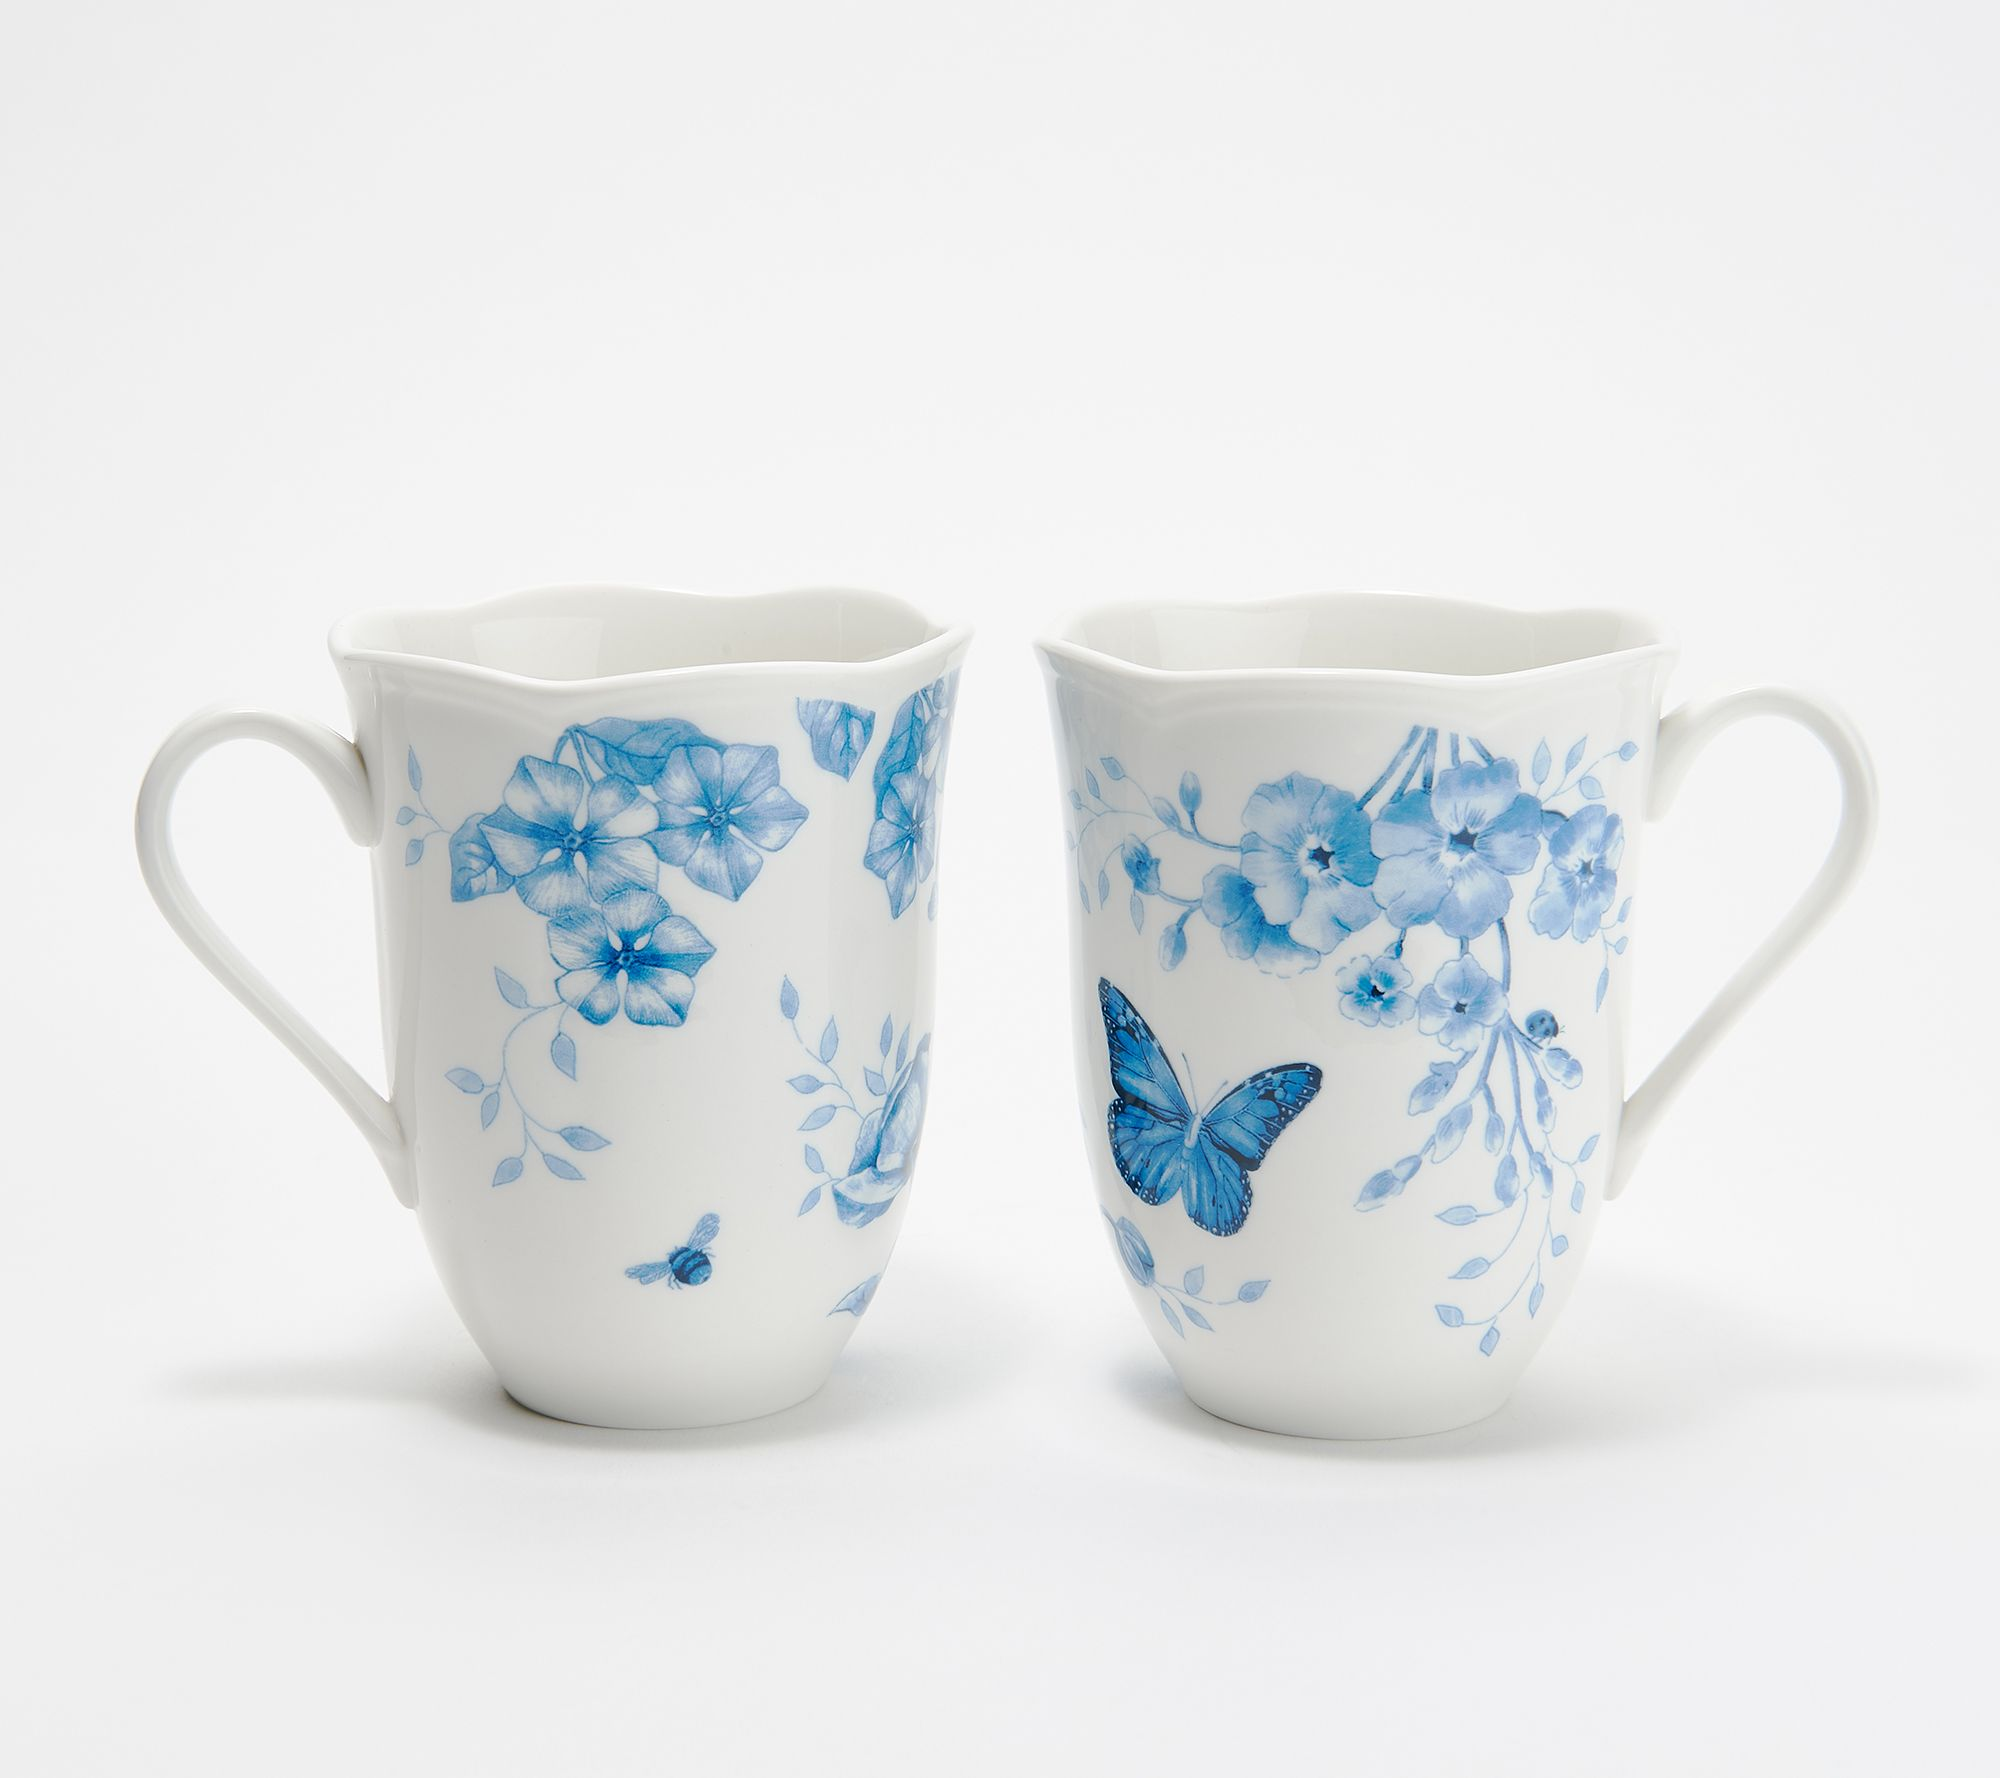 Lenox 4 Pc Butterfly Meadow Toile Porcelain Mug Set Qvc Com